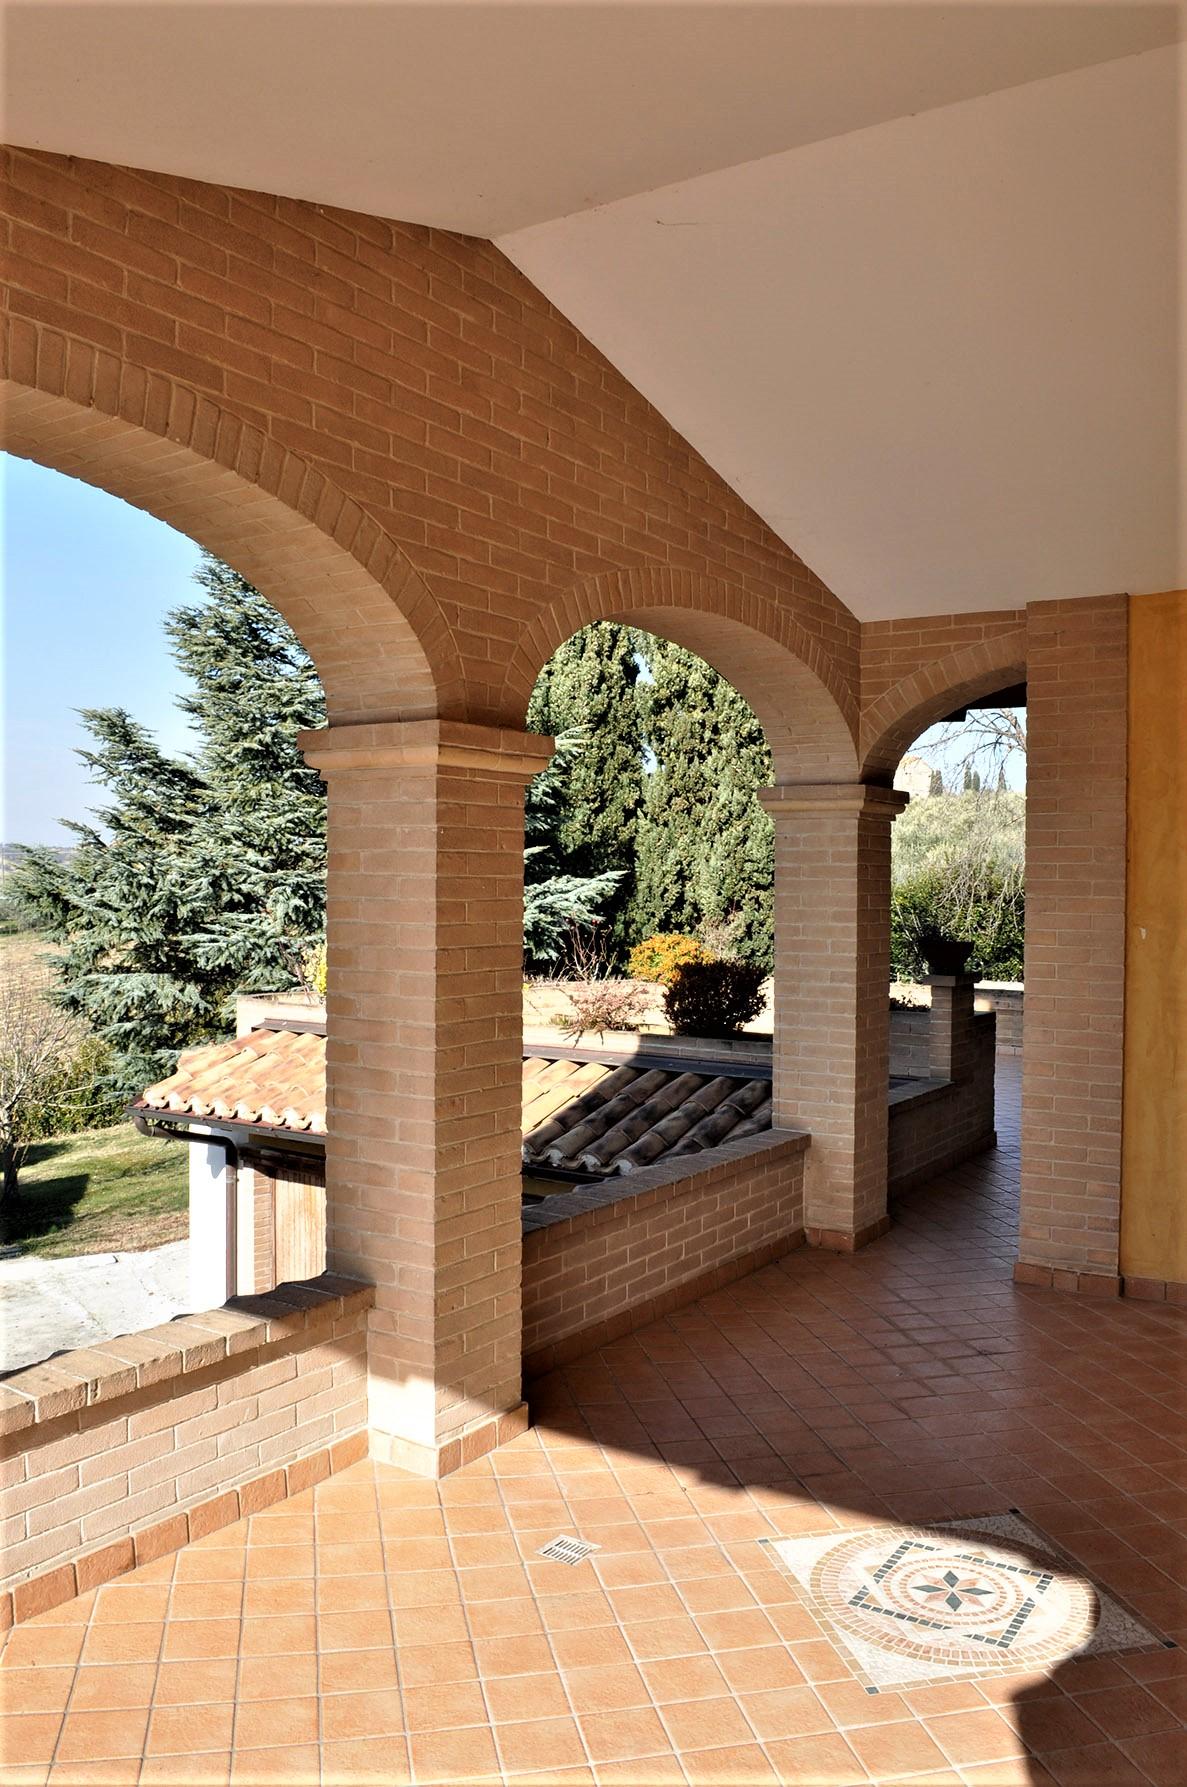 Villa Villa for sale Tortoreto (TE), Villa Bianca - Tortoreto - EUR 770.233 520